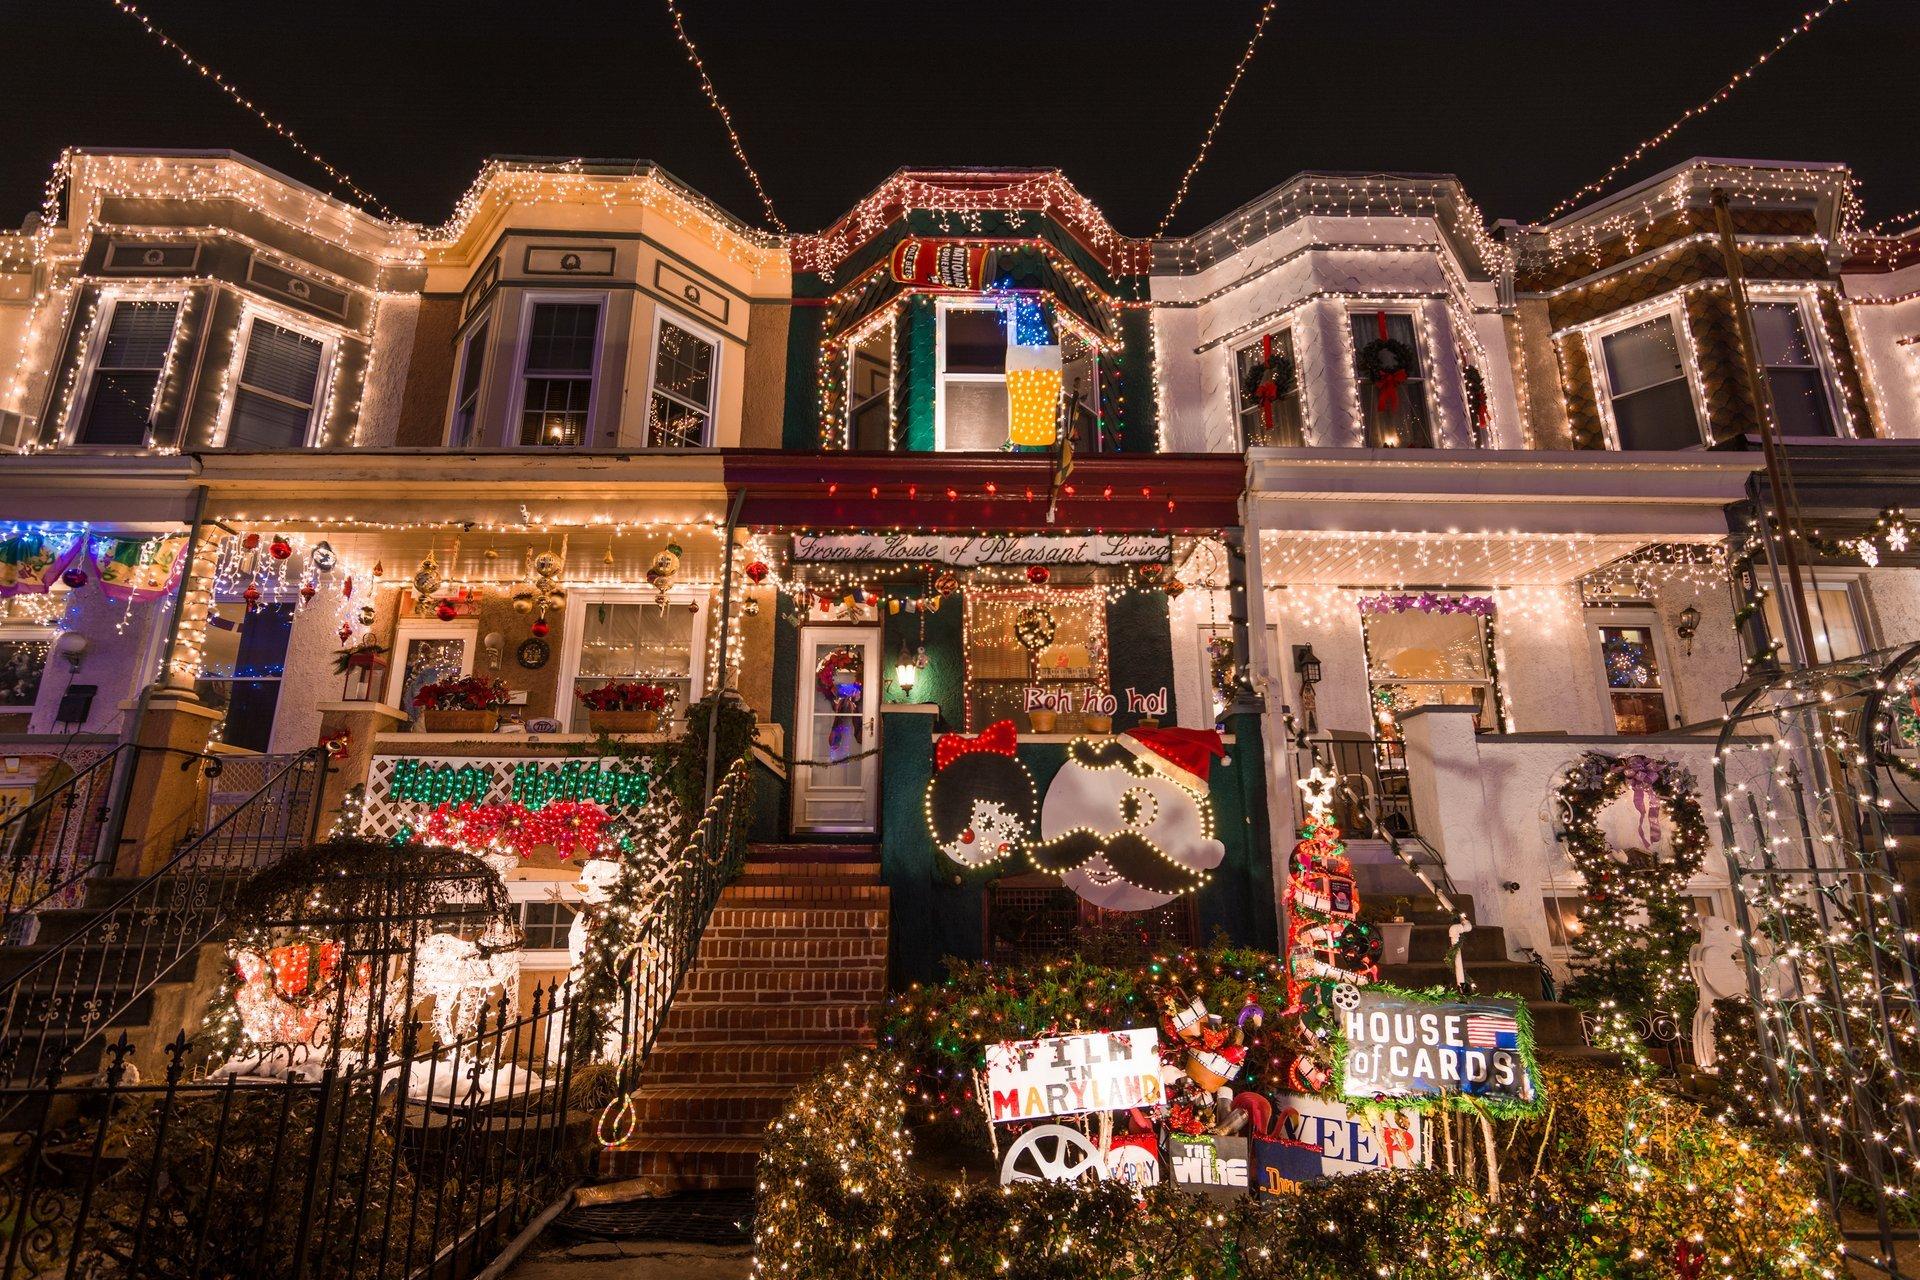 Baltimore's 34th Street 2020